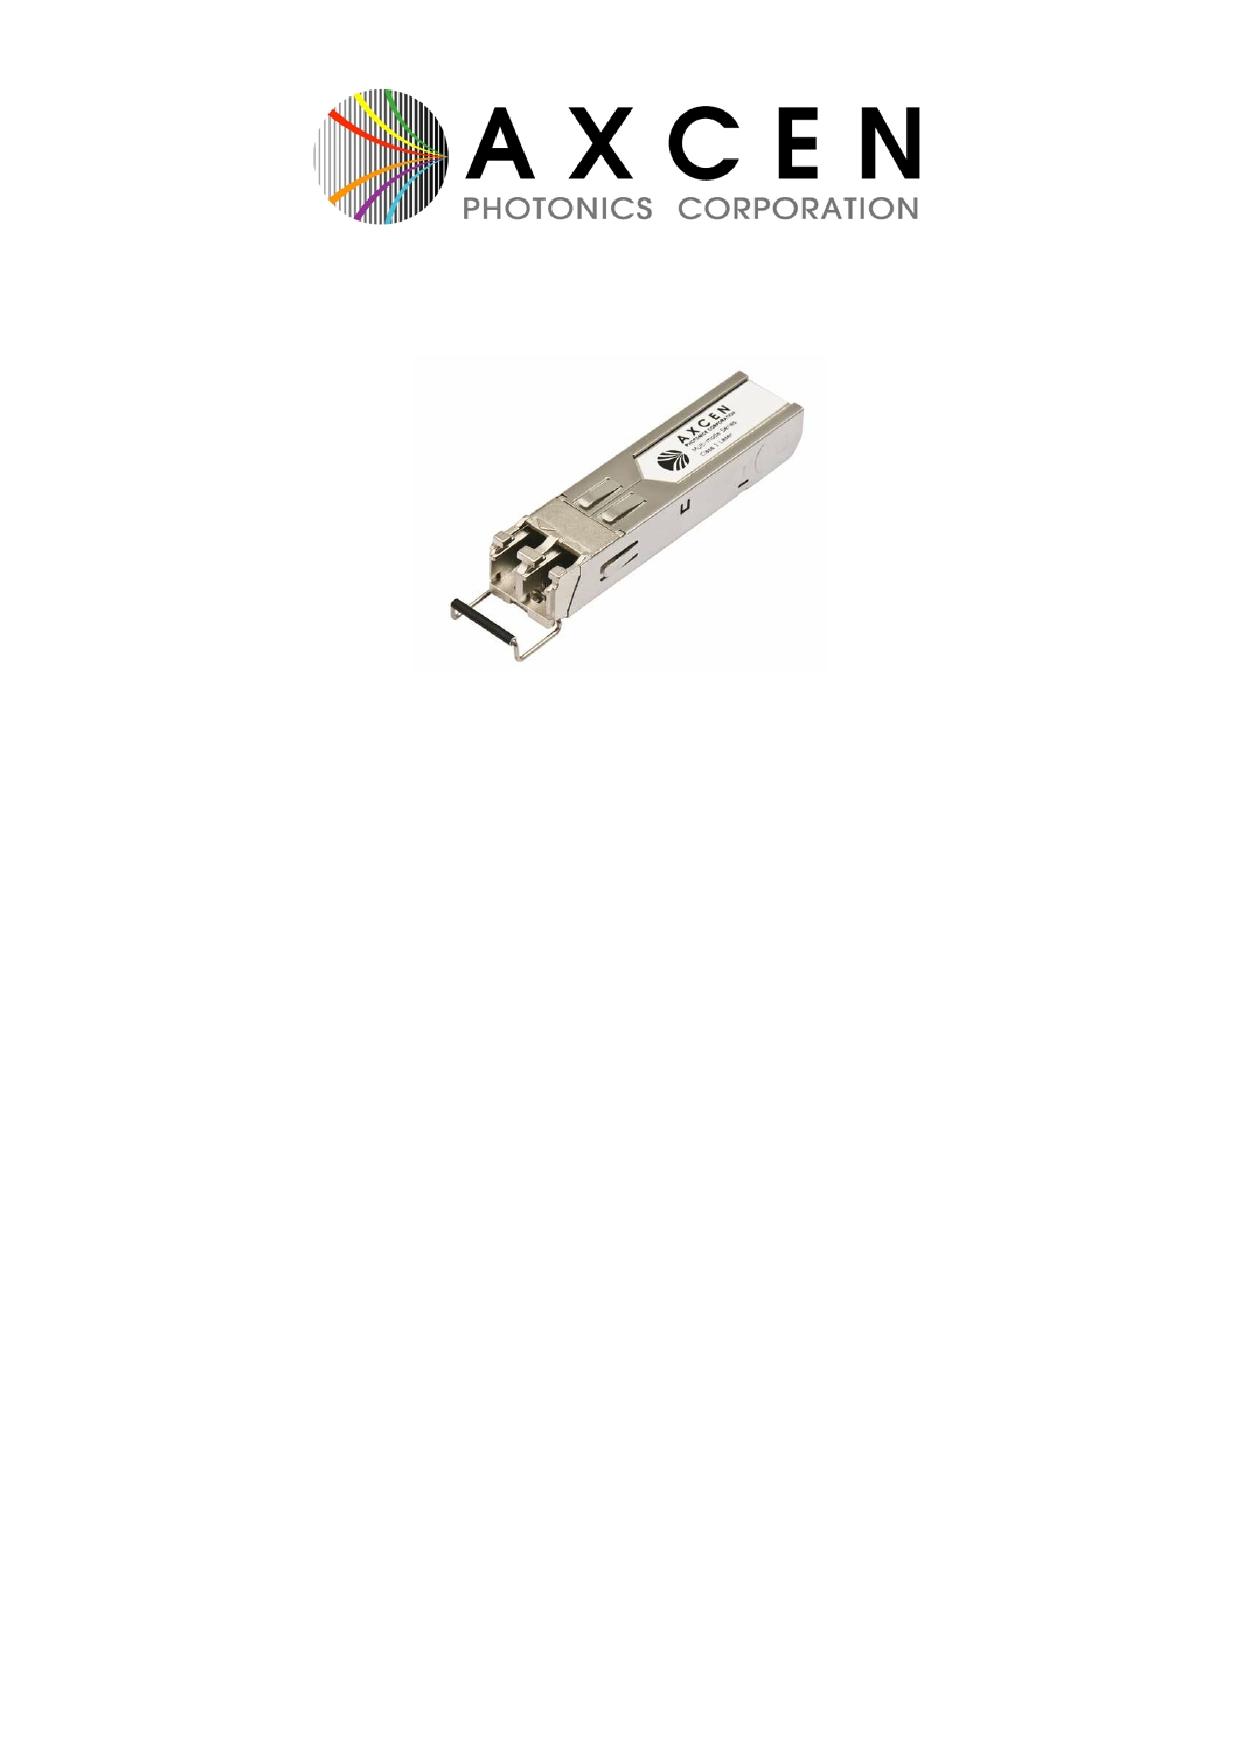 AXGE-5854 Даташит, Описание, Даташиты